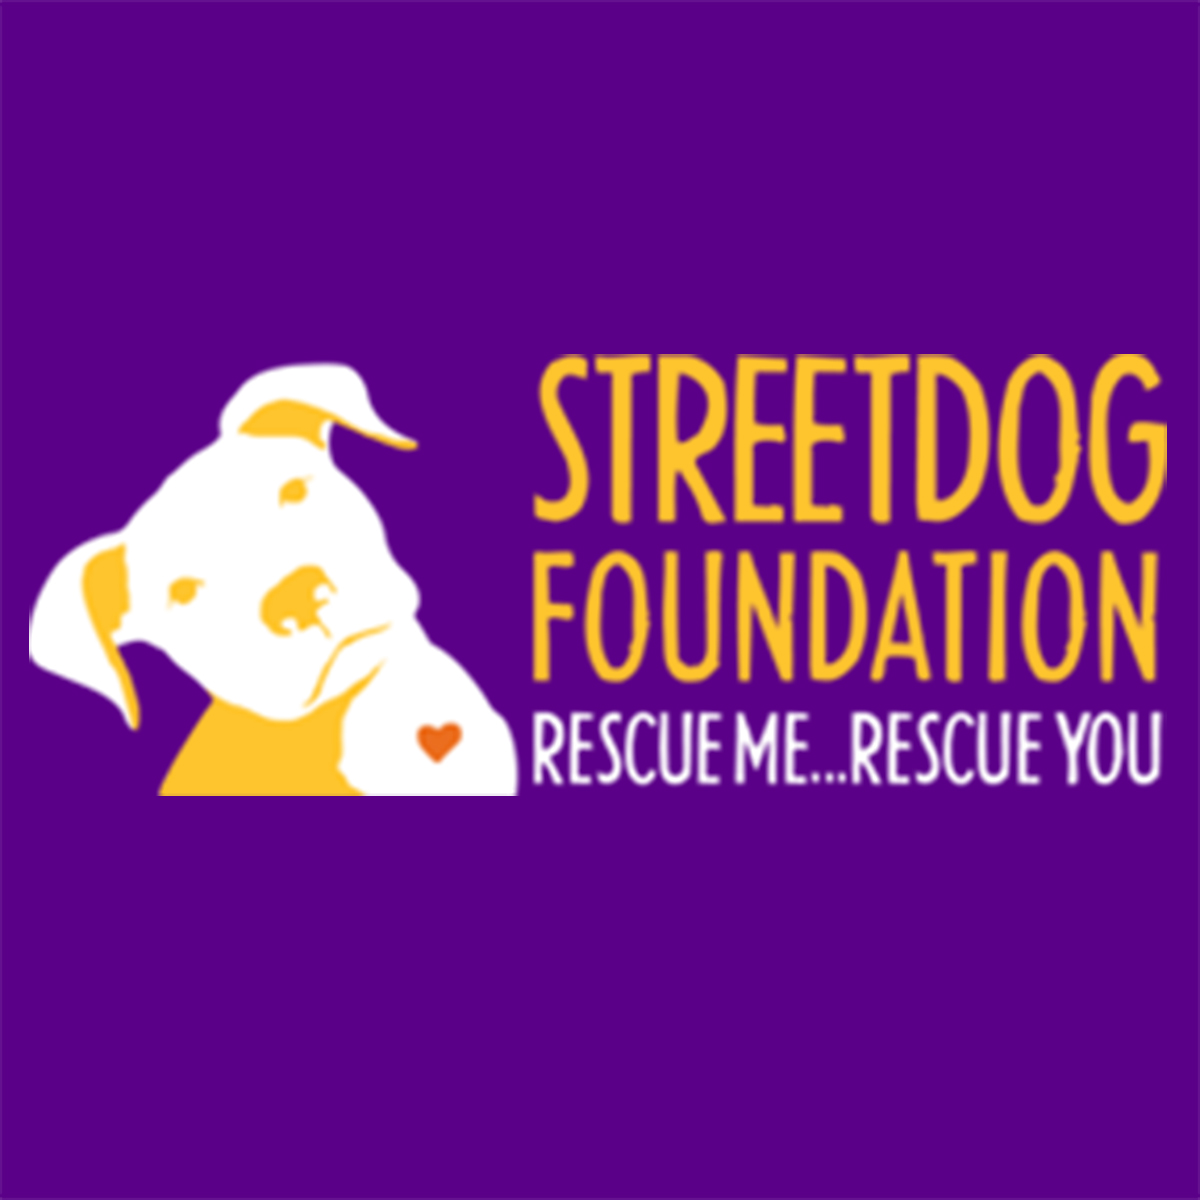 Street Dog Foundation.jpg